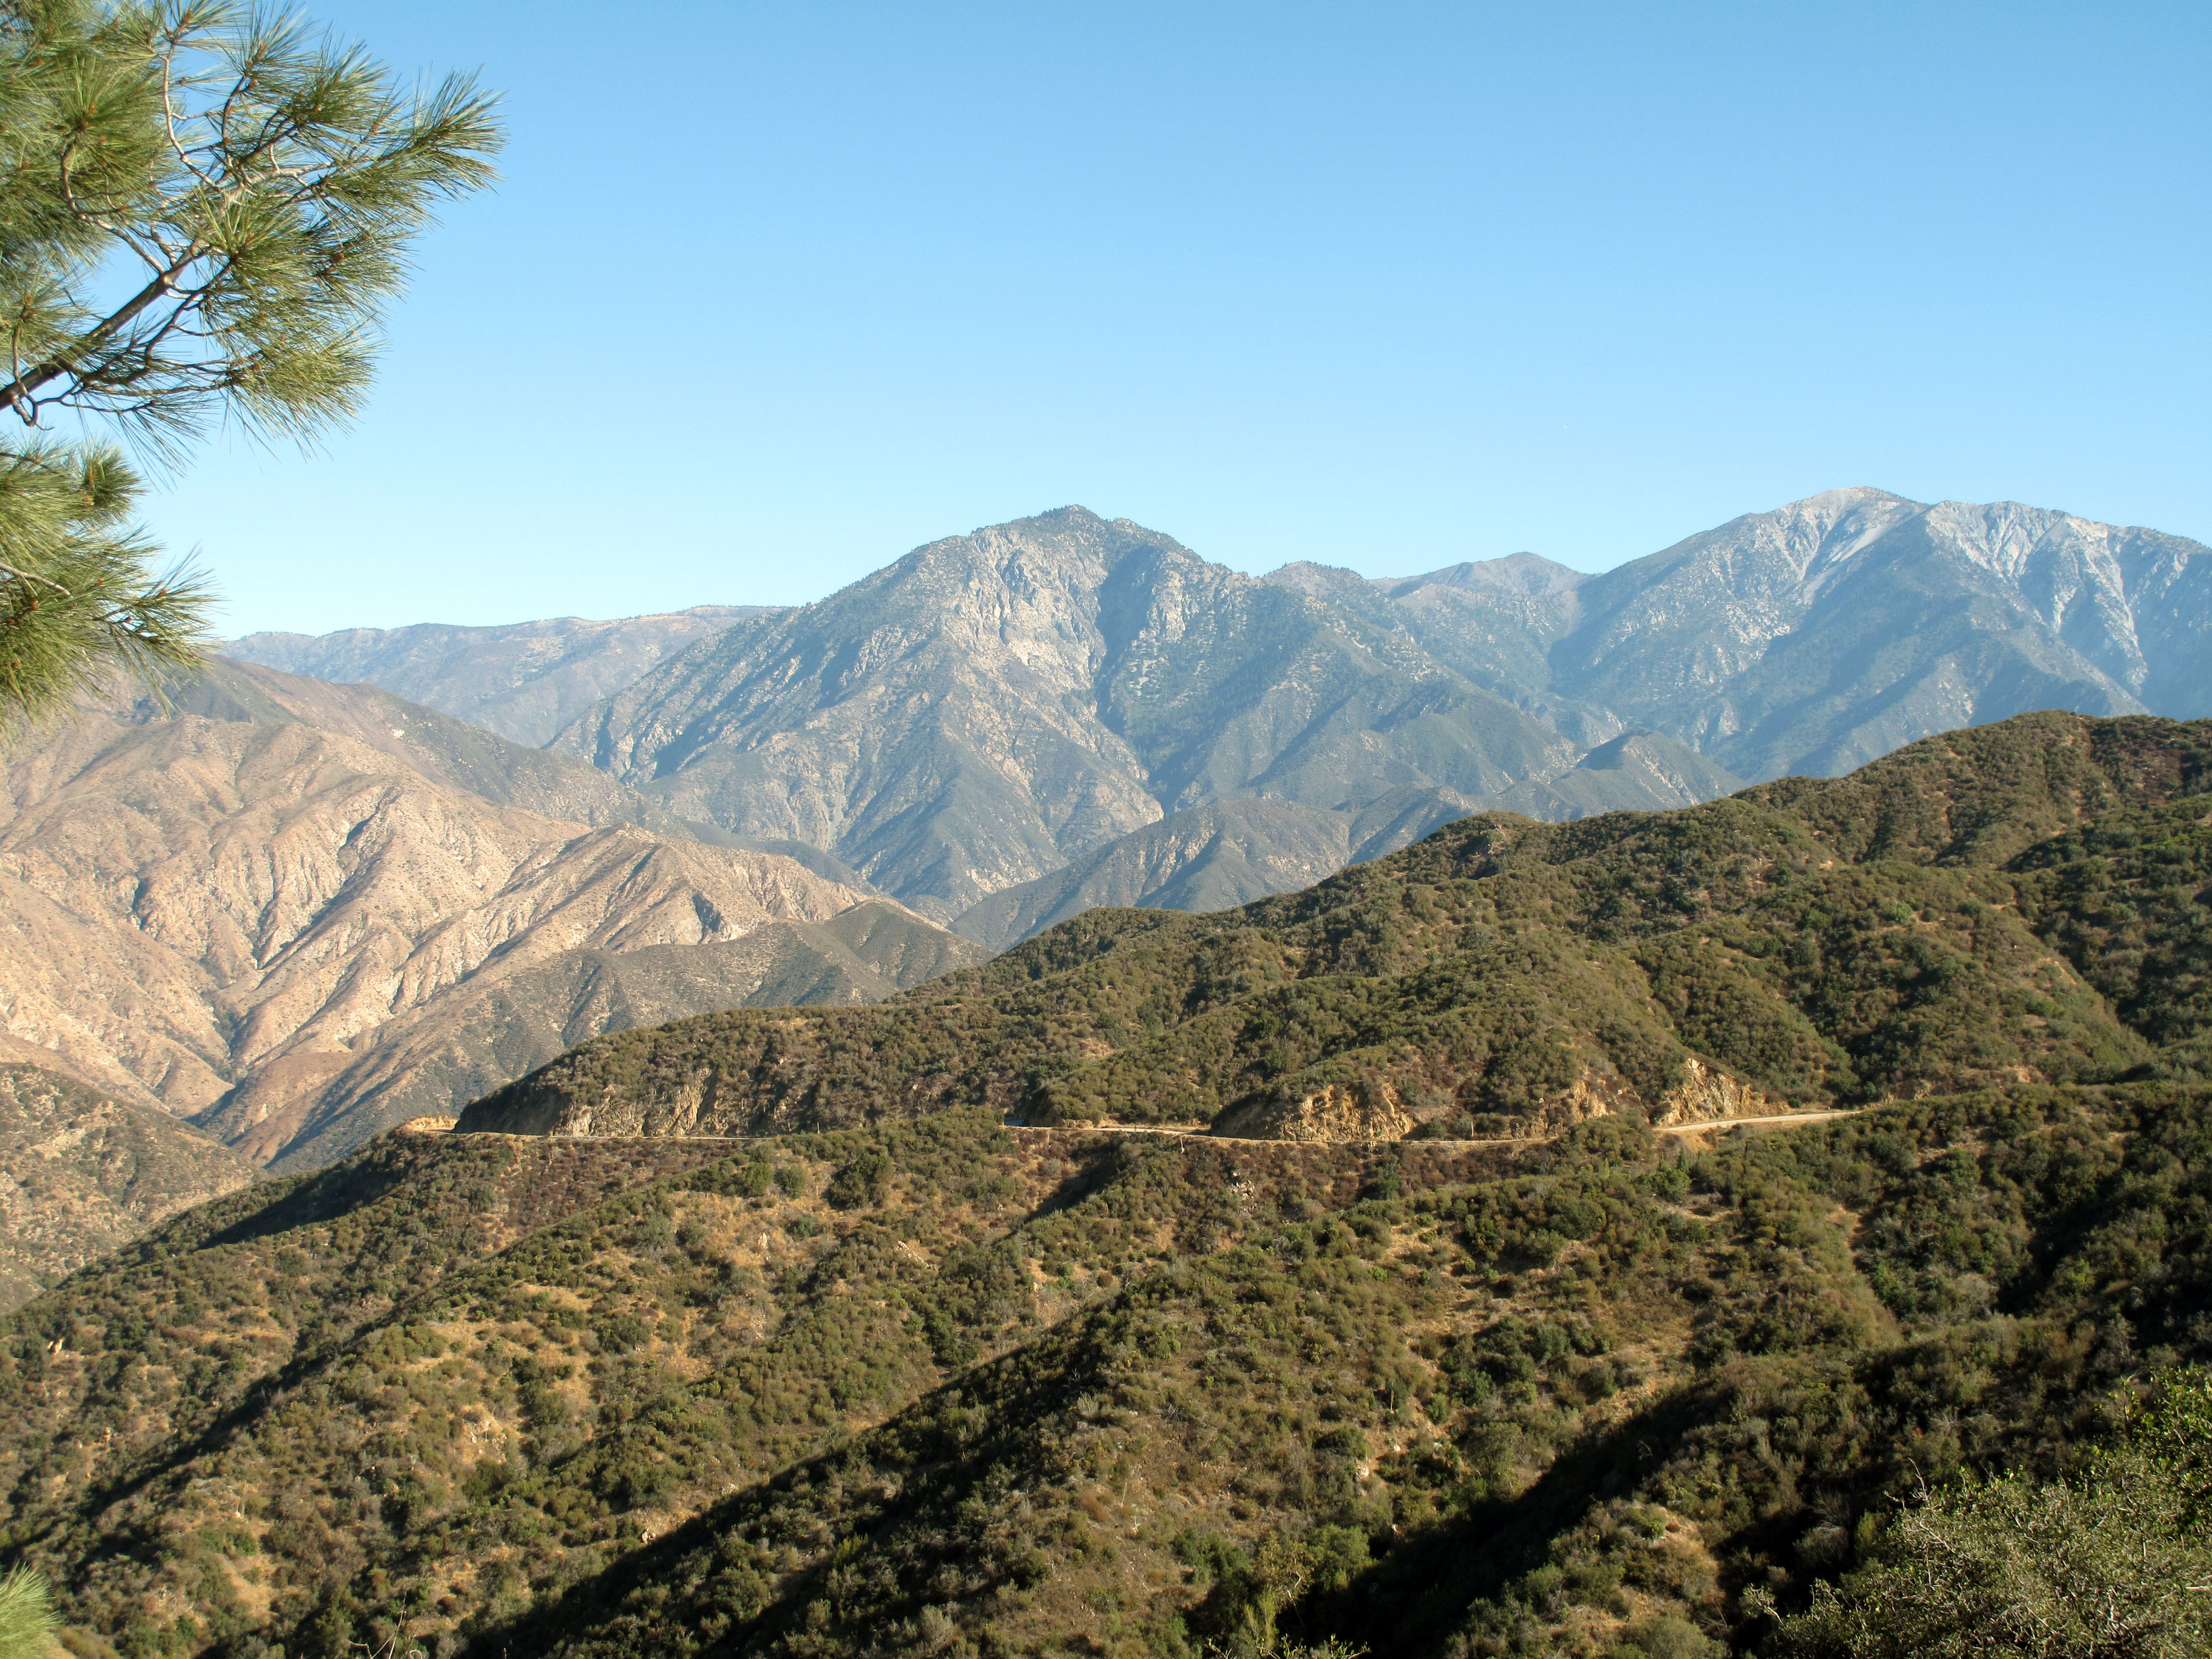 Photo Gallery - Azusa Canyon, Glendora Mountain Road